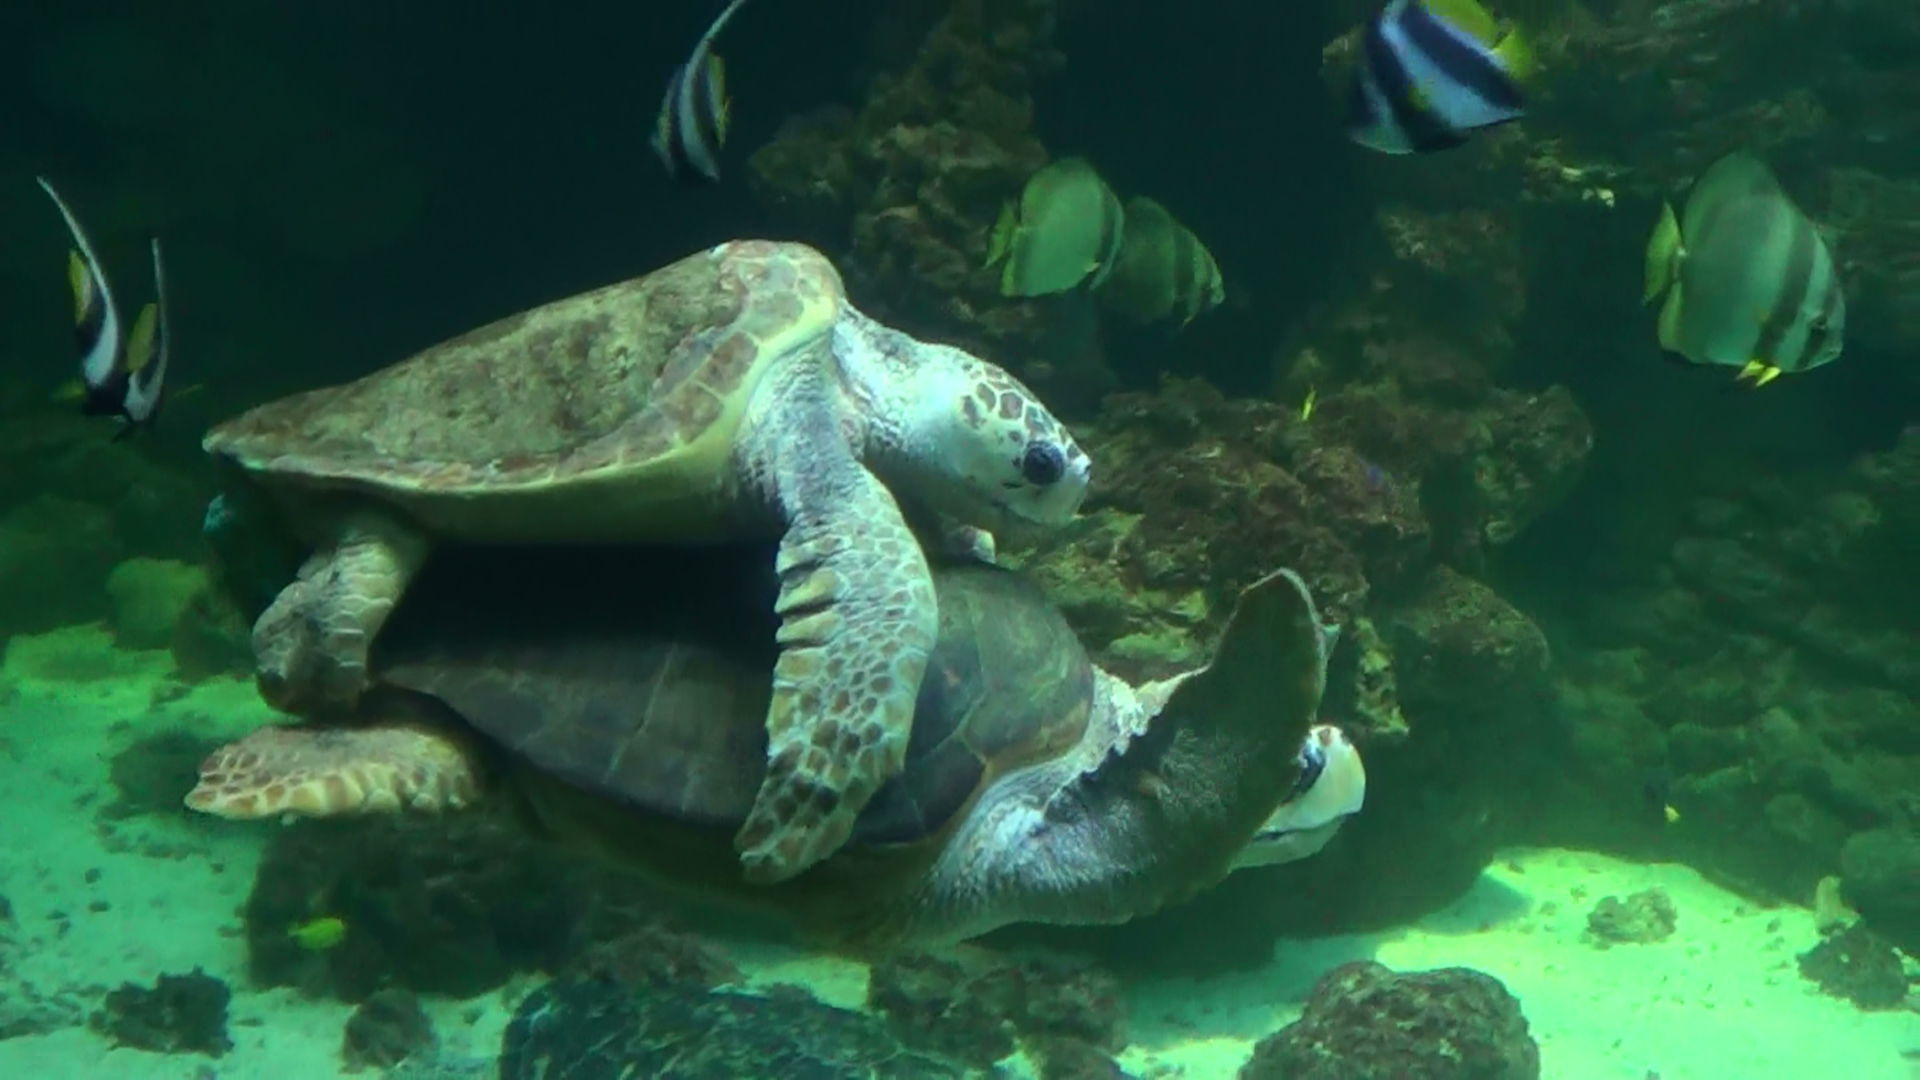 Paarung Carettschildkröte (2)